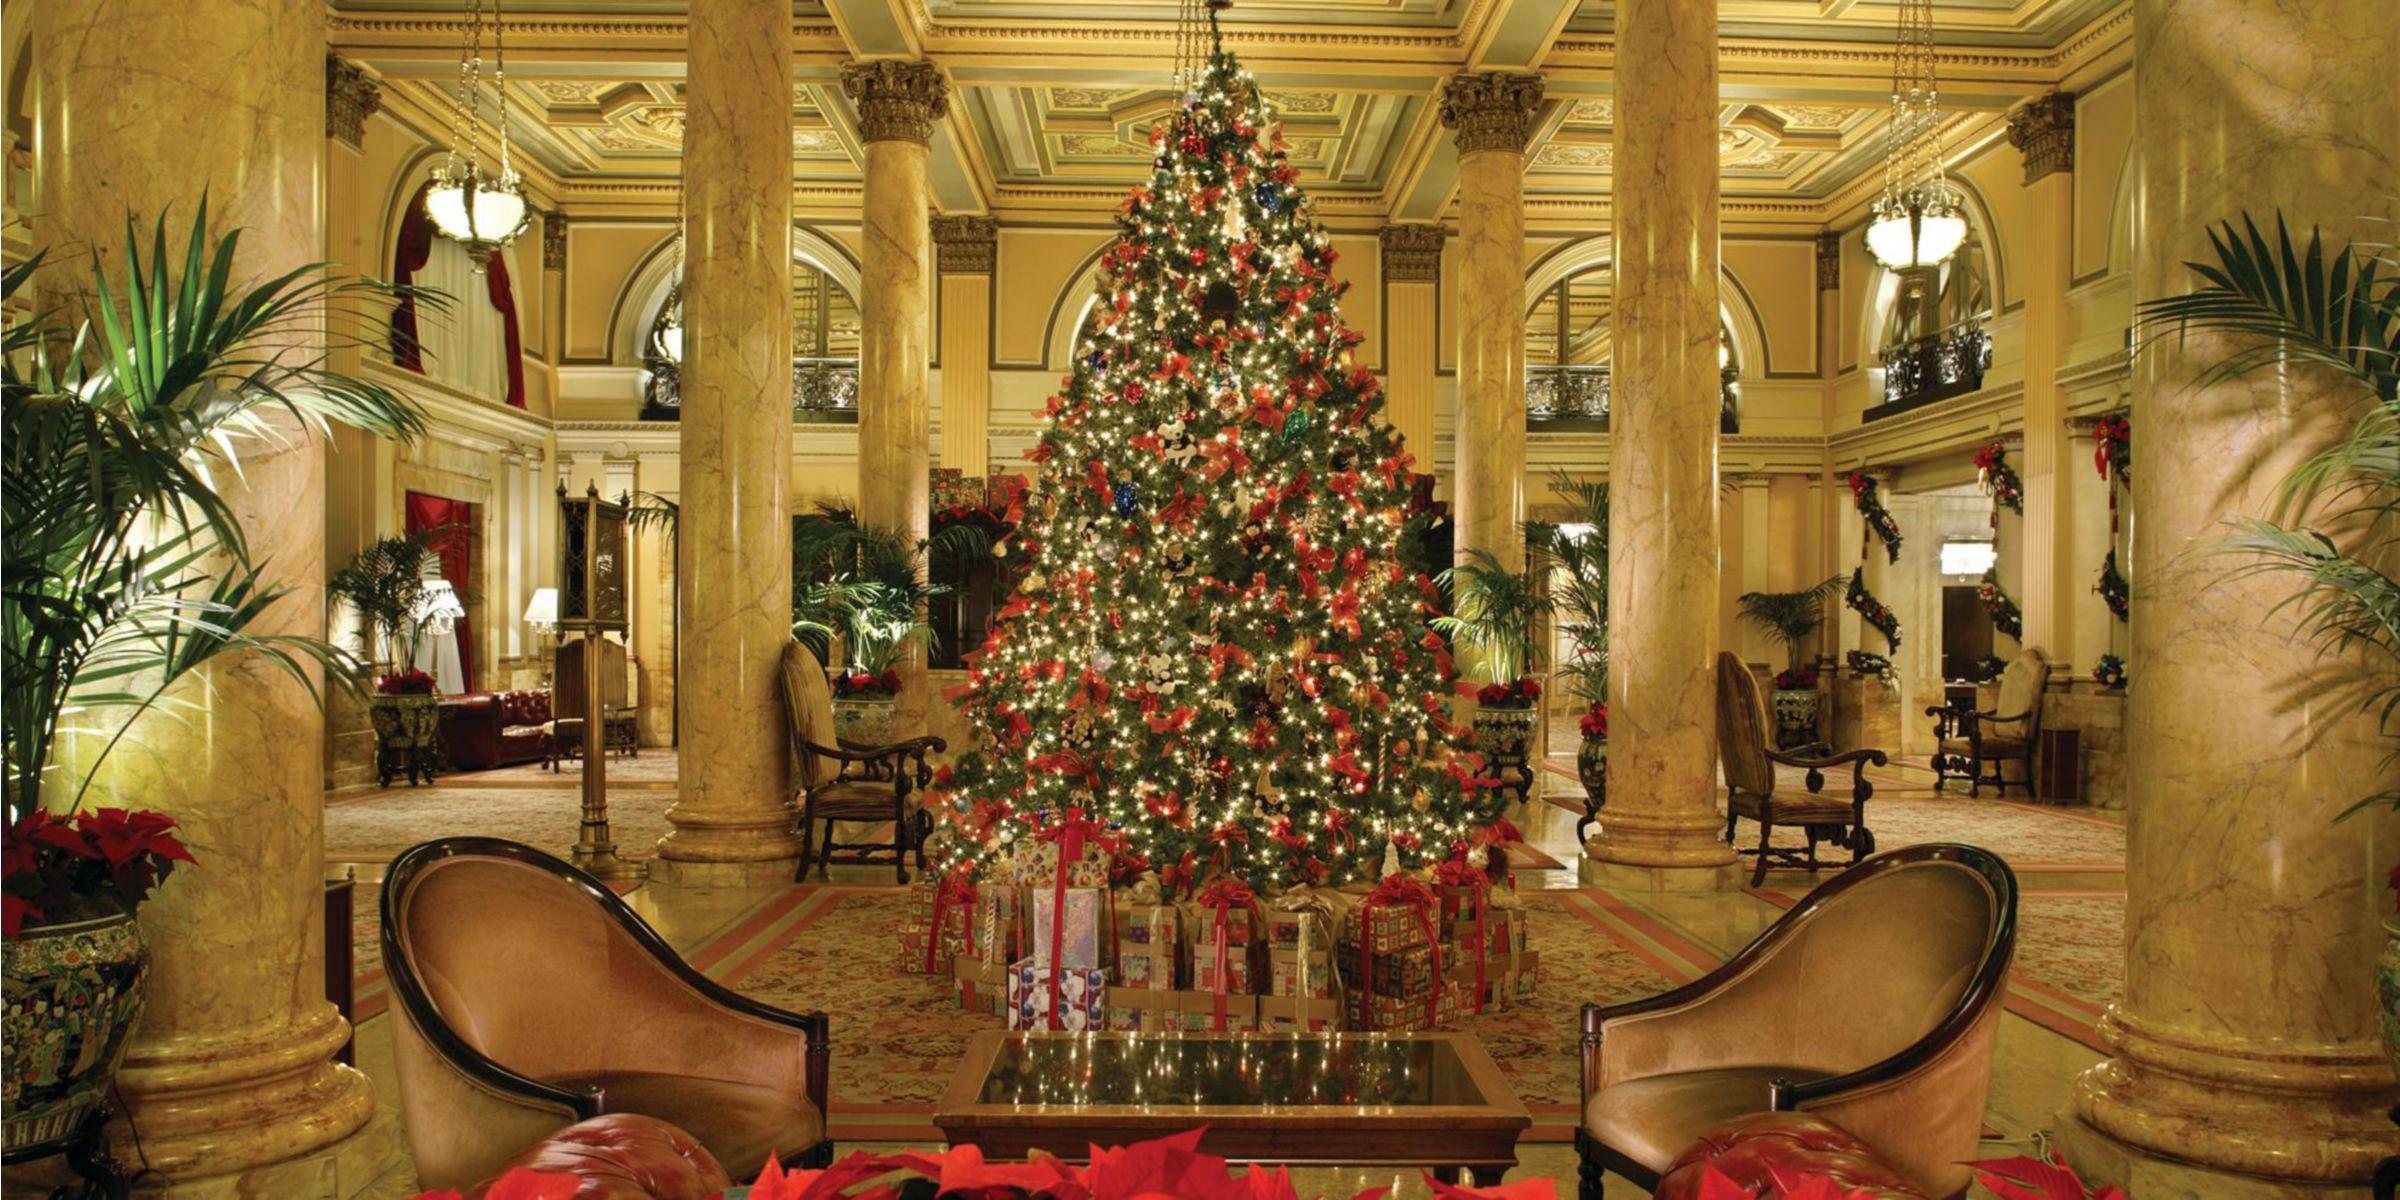 Luxury Hotels In Dc Intercontinental The Willard Hotel Washington D C